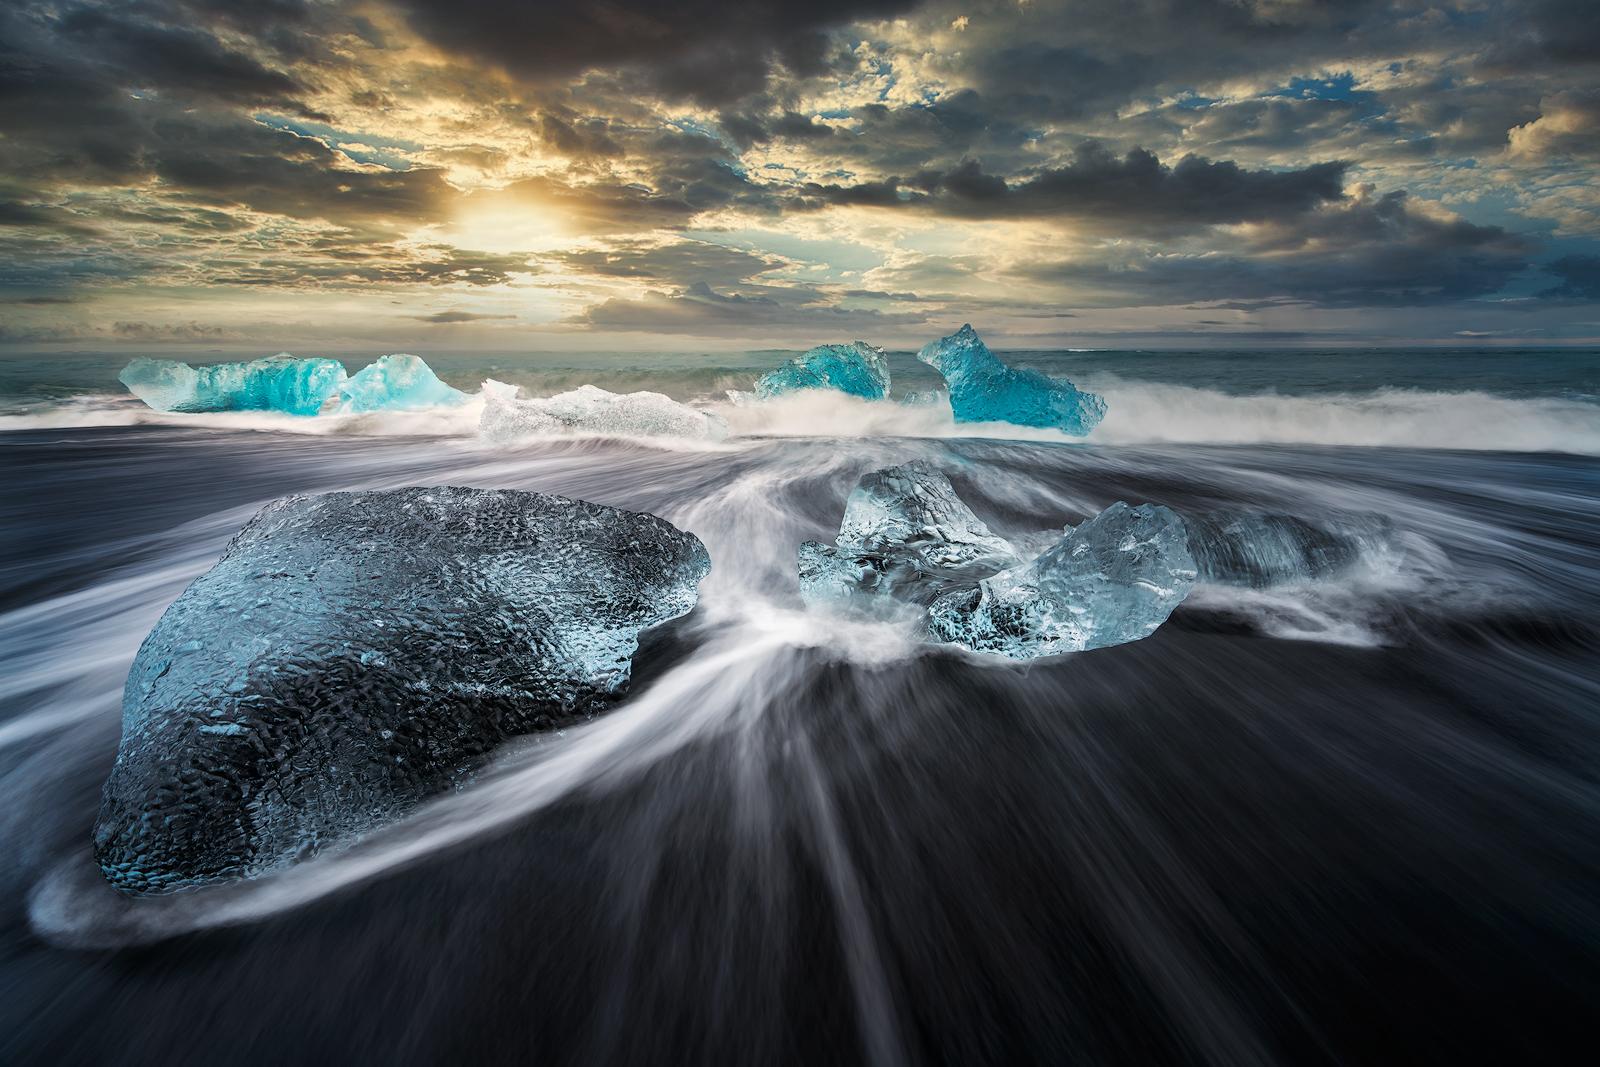 Iceland, Jokulsarlon, Ice Beach, Iceberg, Black Sand, Waves, Motion, Water Motion, Sunset, Cloudy, Bernard Chen, Timescapes